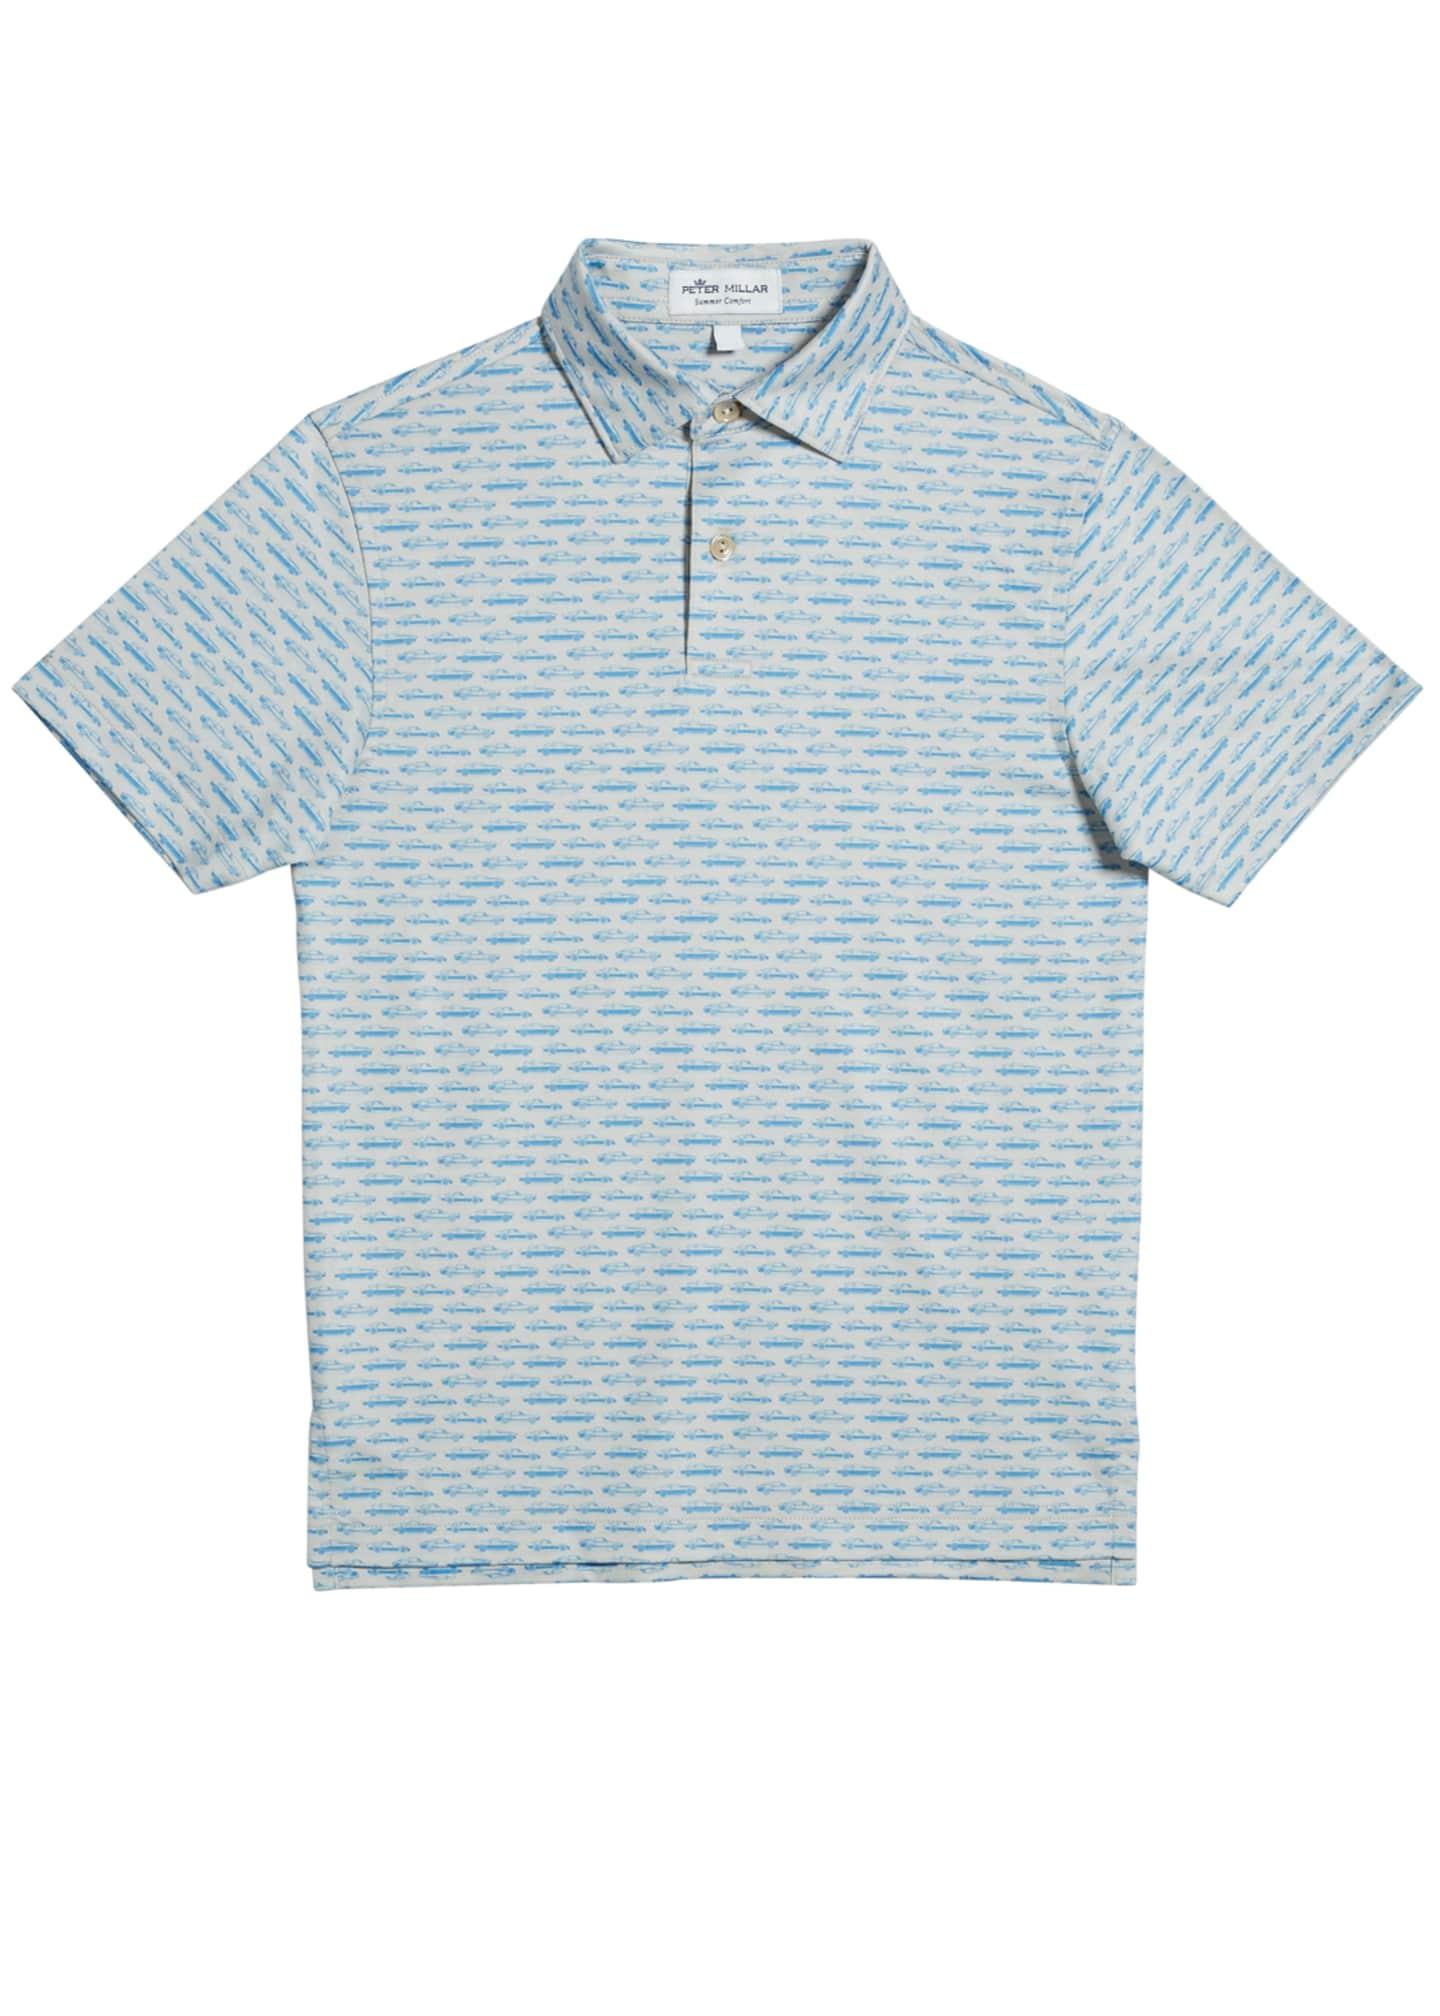 Peter Millar Boy's Car-Print Jersey Polo Shirt, Size